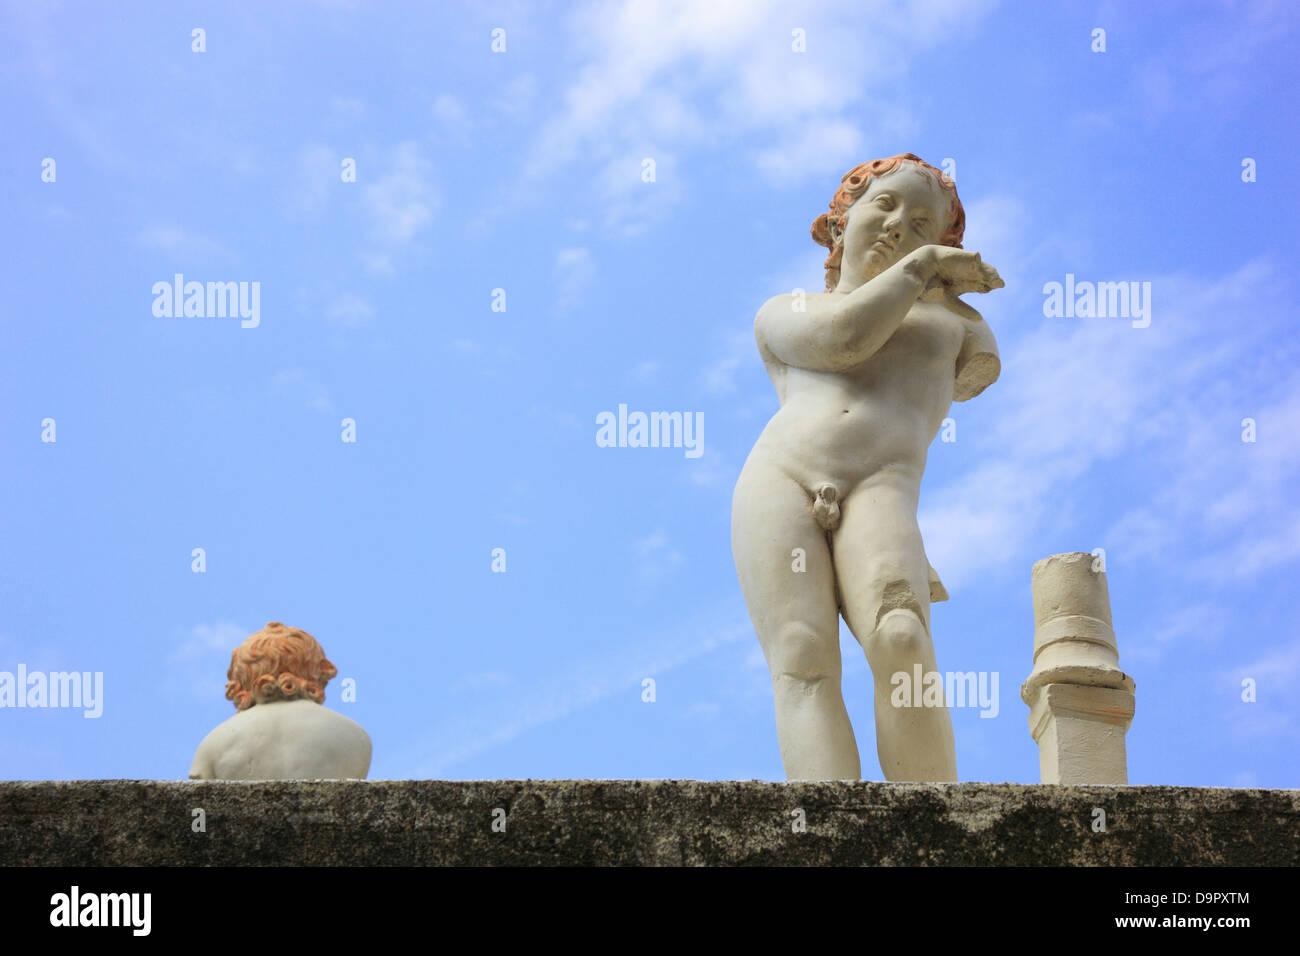 Angel figure on the terrace Nonio Balbo, ruined city of Herculaneum, Campania, Italy - Stock Image